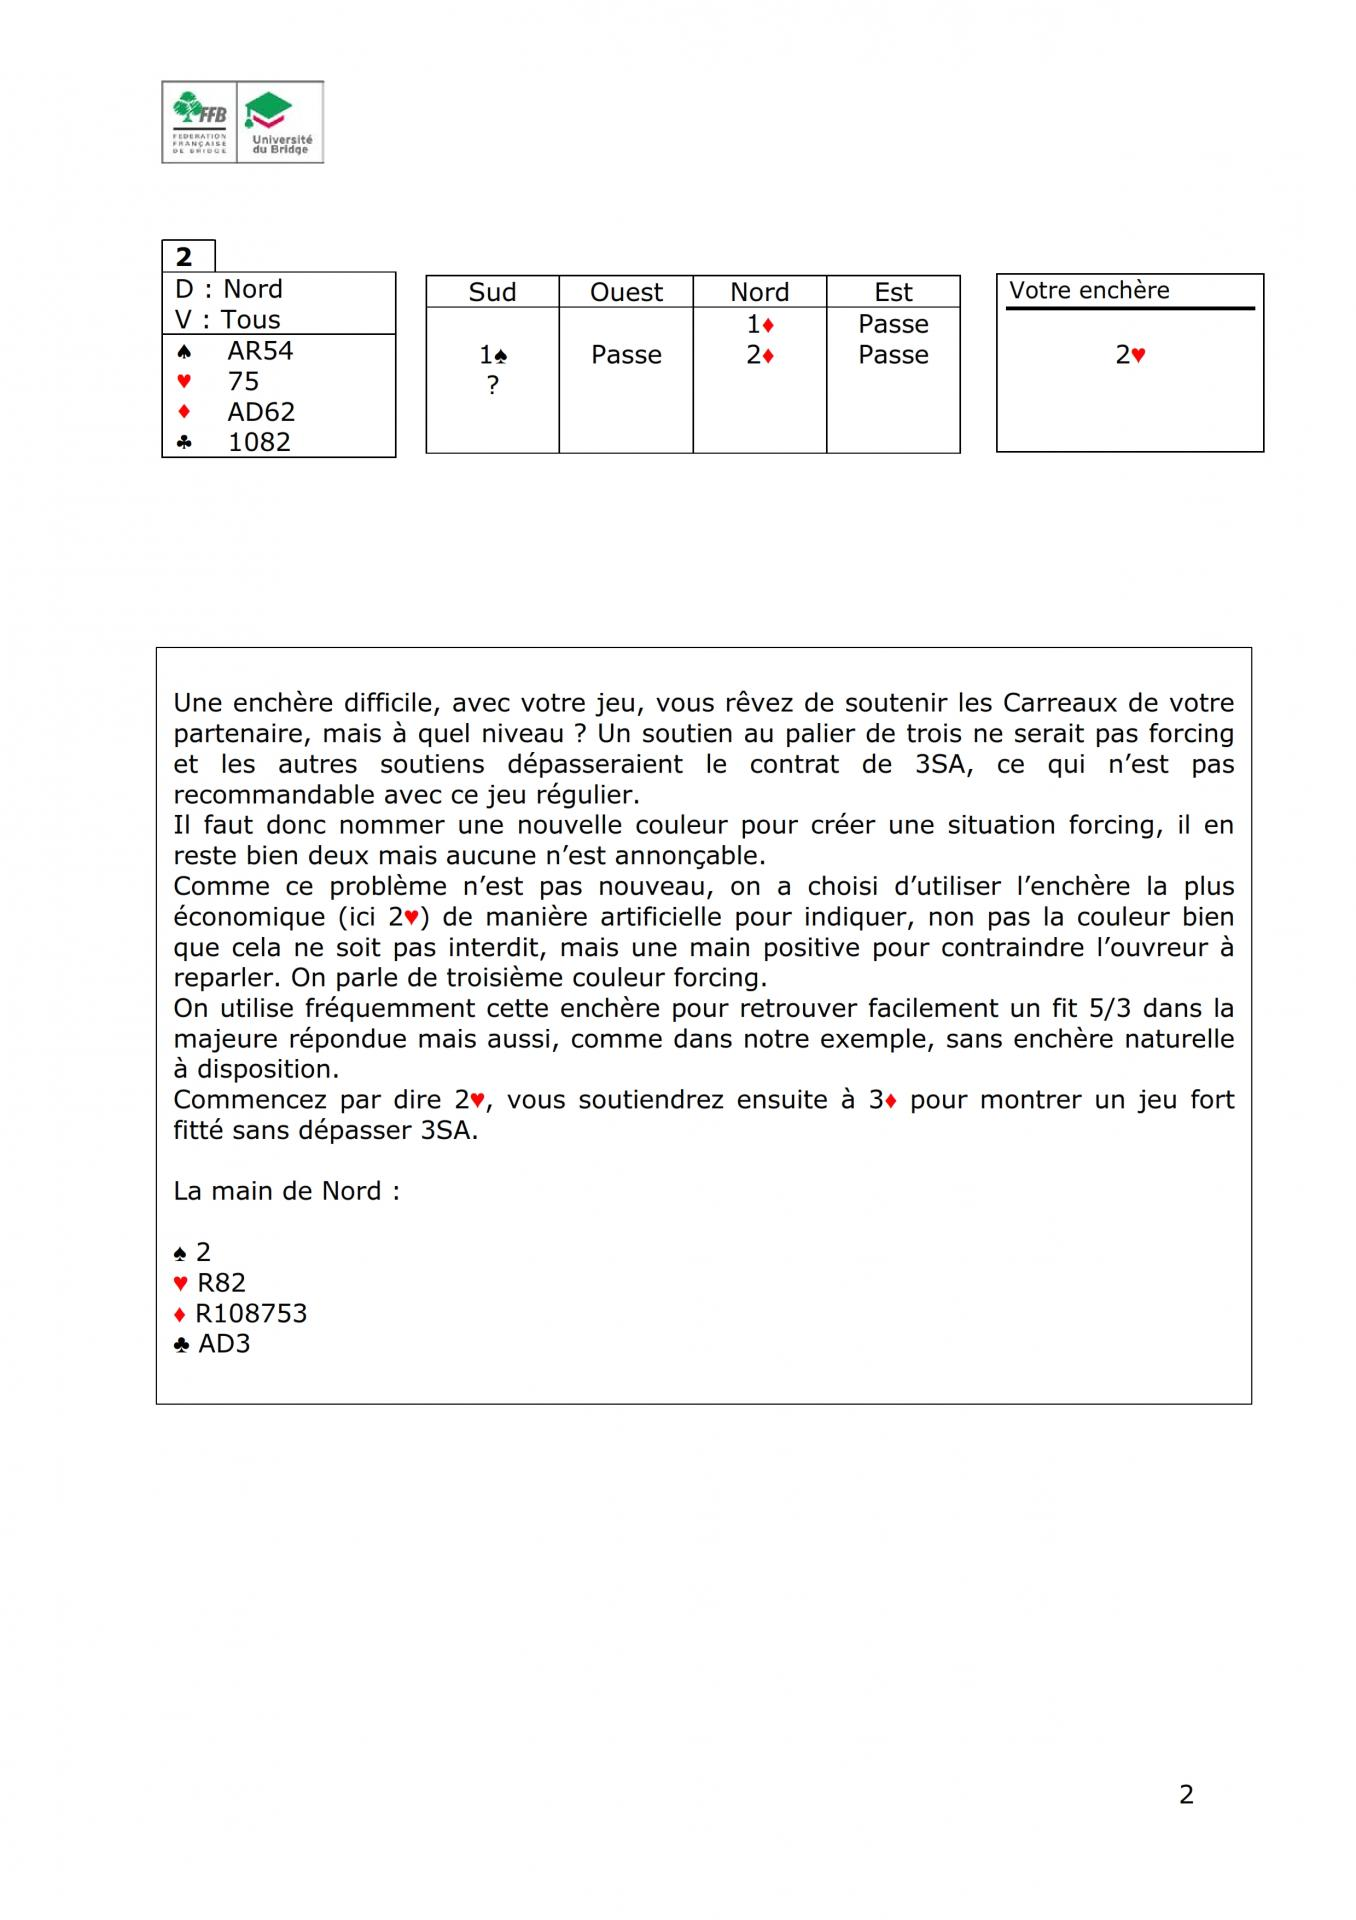 Formation continue des moniteurs solutions avril 2020 002